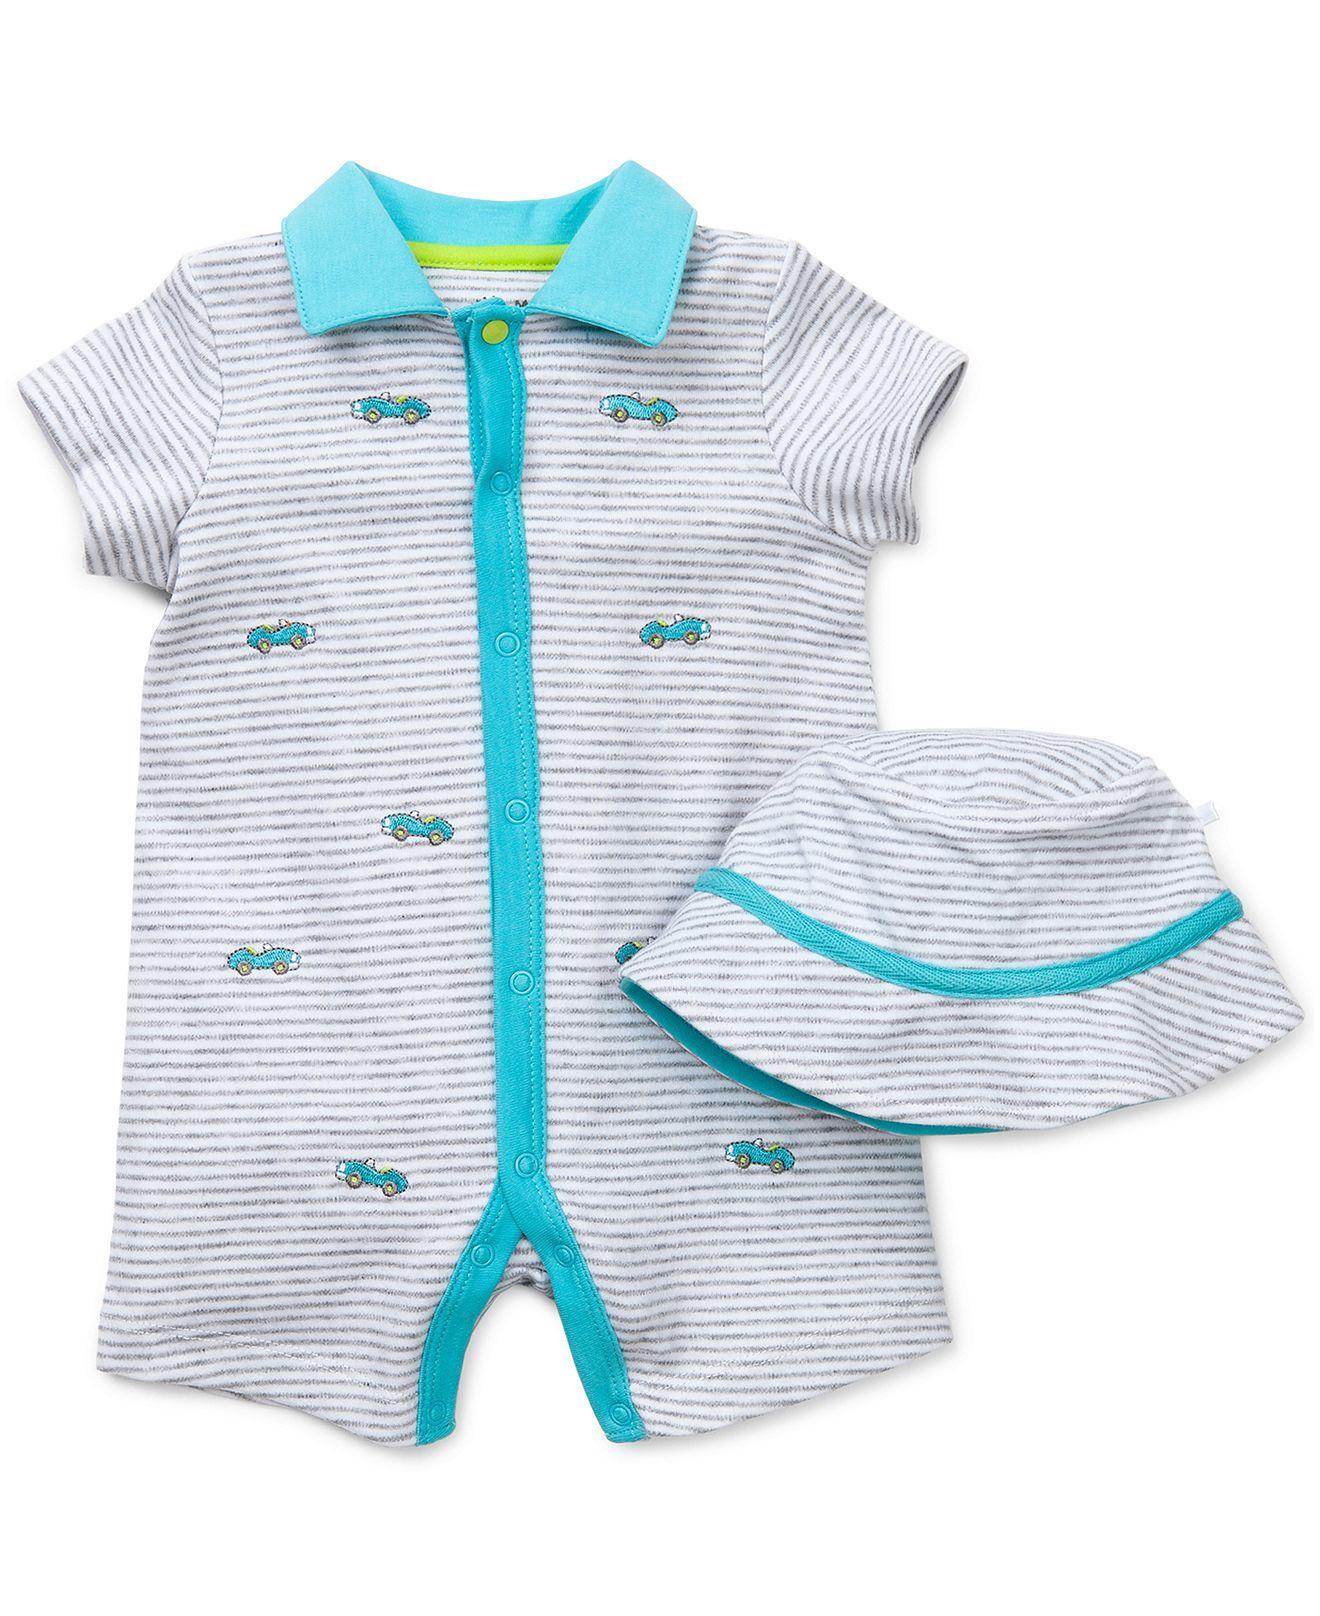 6720b1241 Little Me Baby Boys' 2-Piece Hat & Cars Romper Set - Kids Baby Boy ...